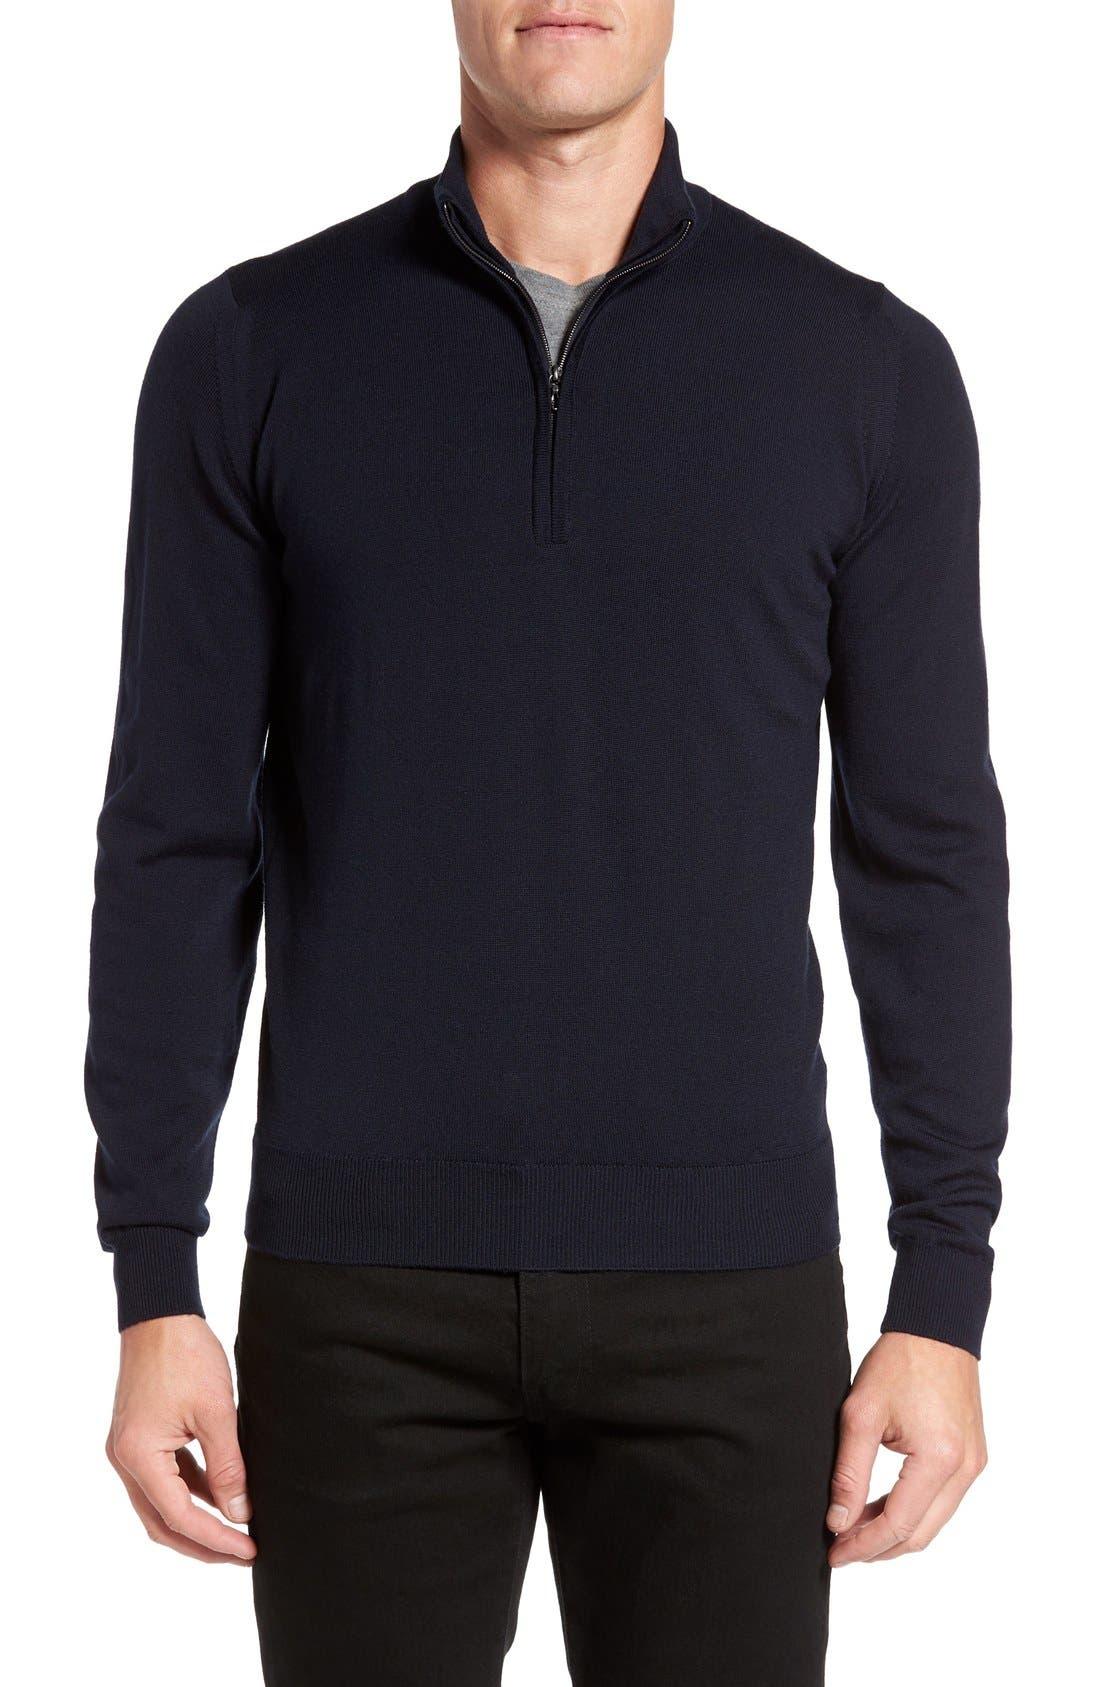 Main Image - John Smedley 'Tapton' Quarter Zip Merino Wool Sweater